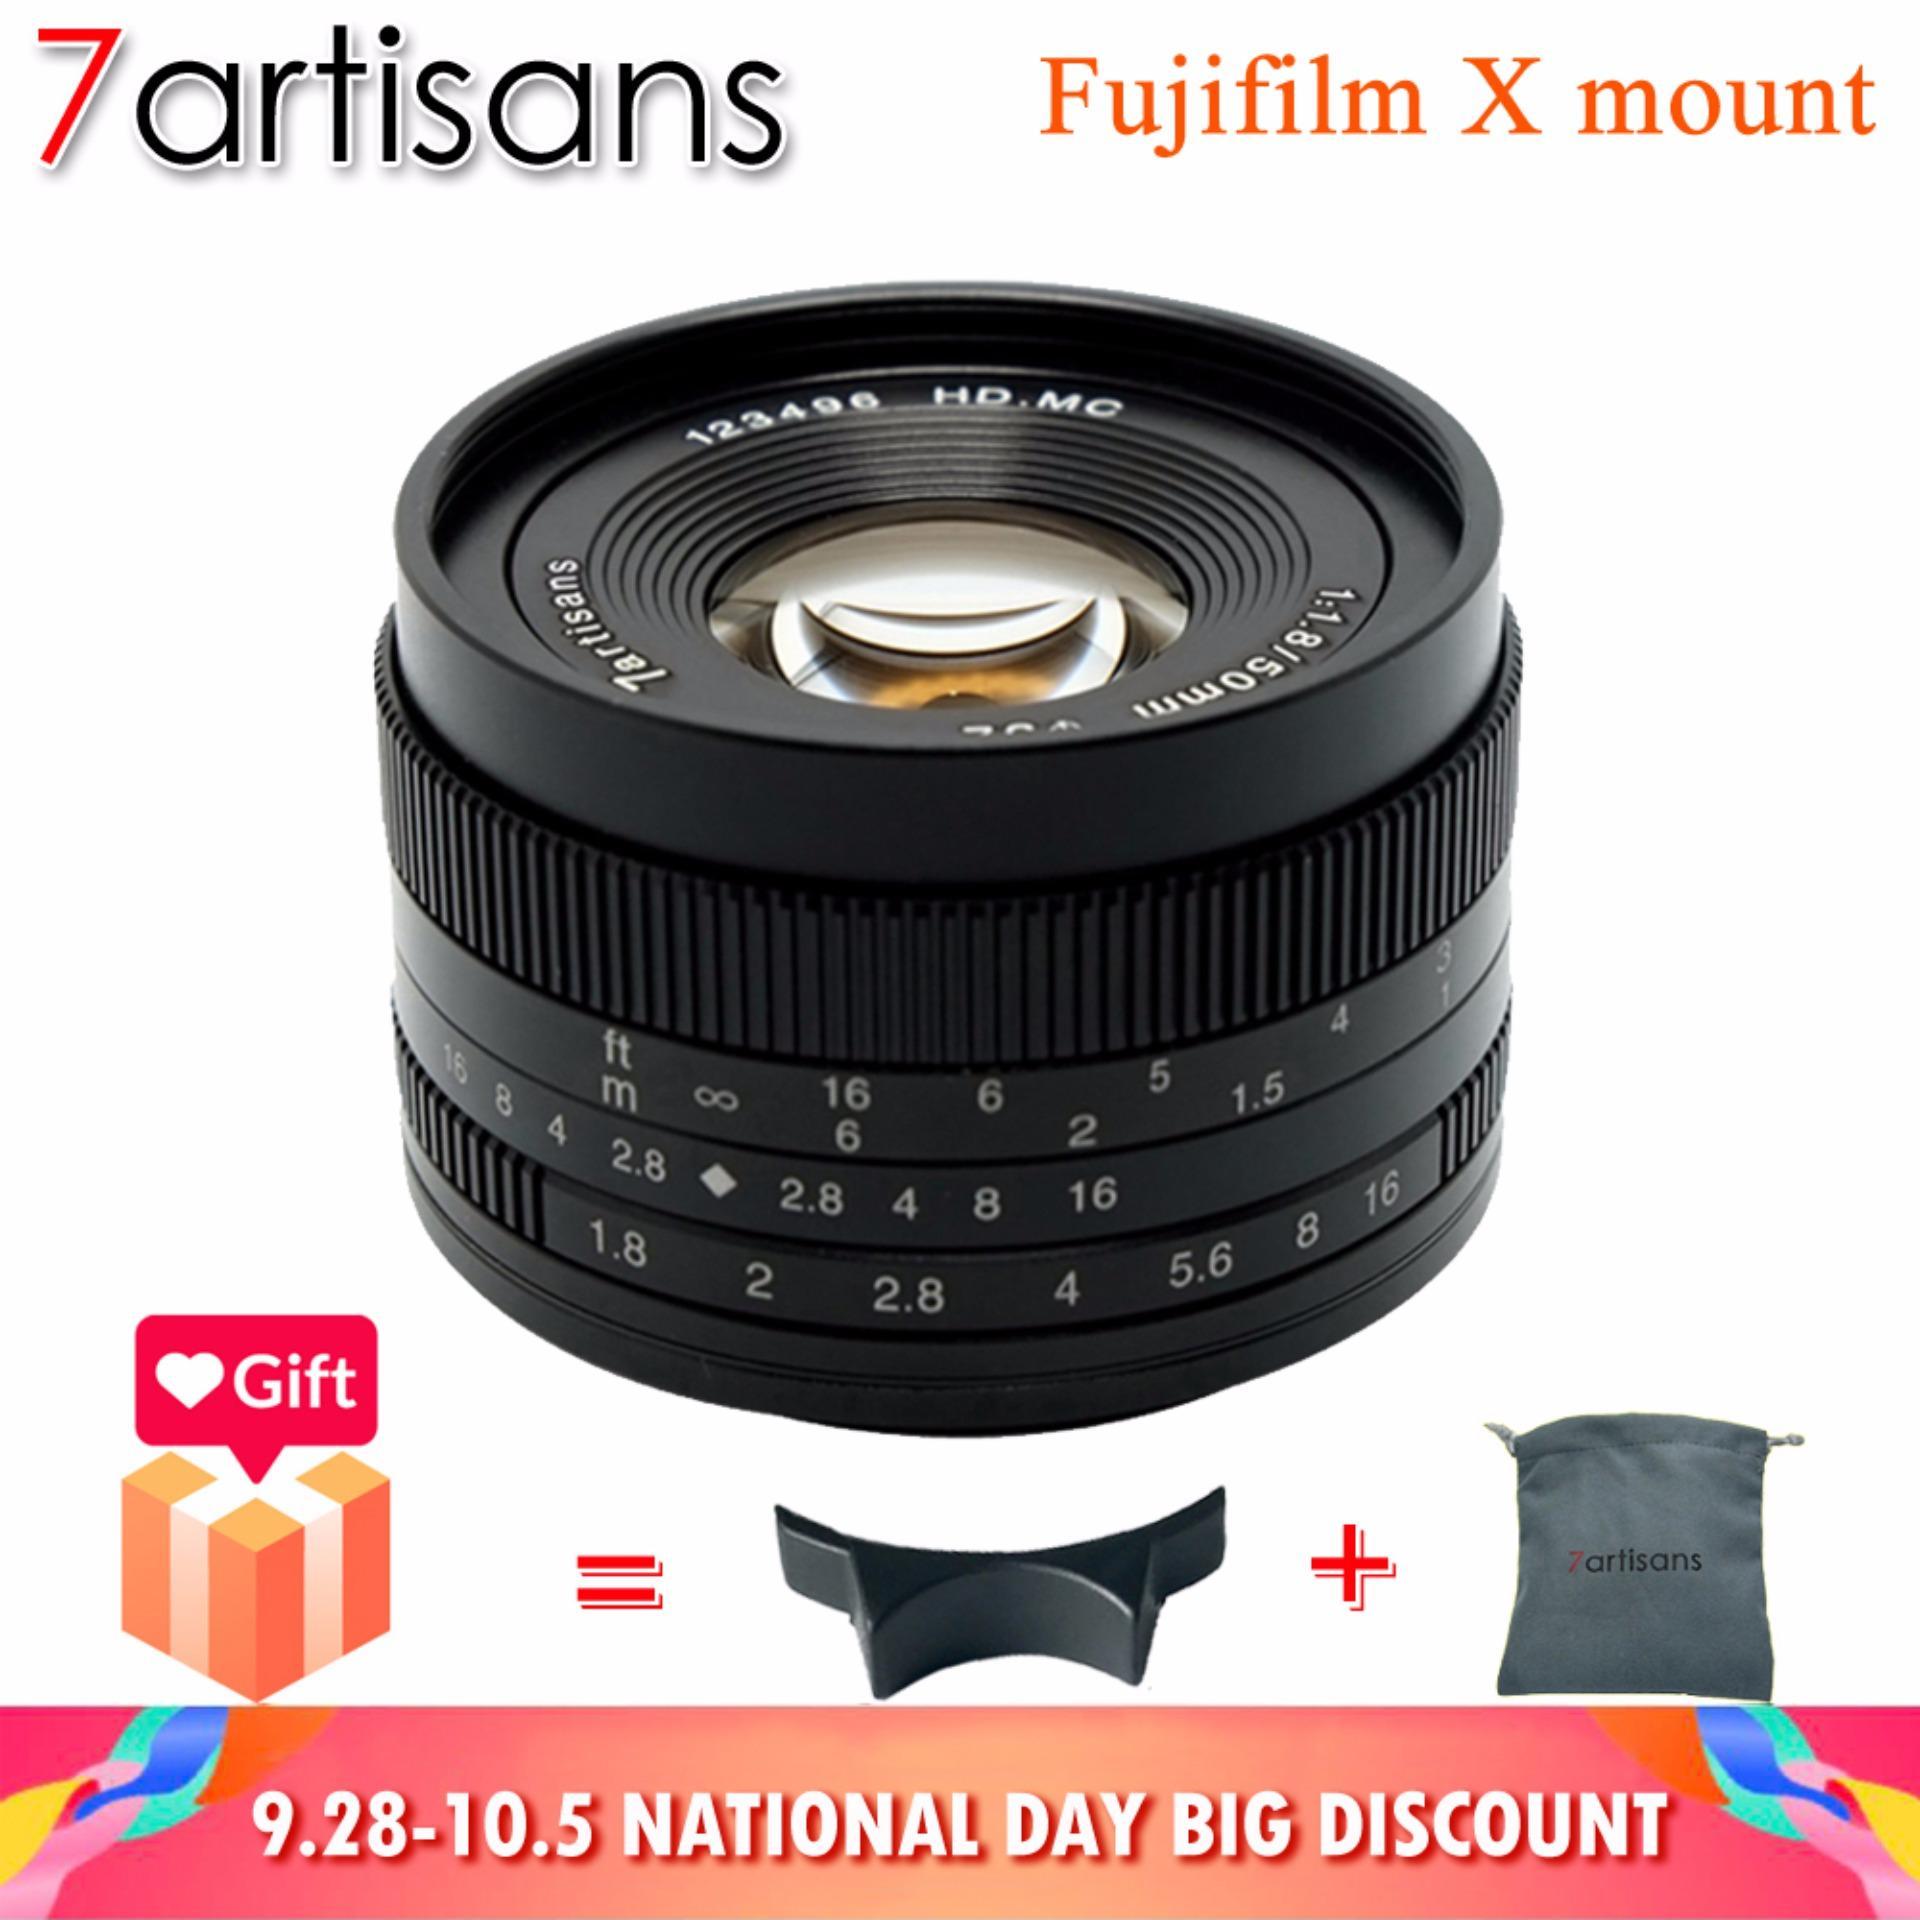 Mirrorless Camera Lenses For Sale Prices Brands Olympus Mzuiko Digital Ed 12 50mm F35 63 Ez Lens Factory Direct 7artisans Fujifilm F18 Aps C Manual Focus Widely Fit